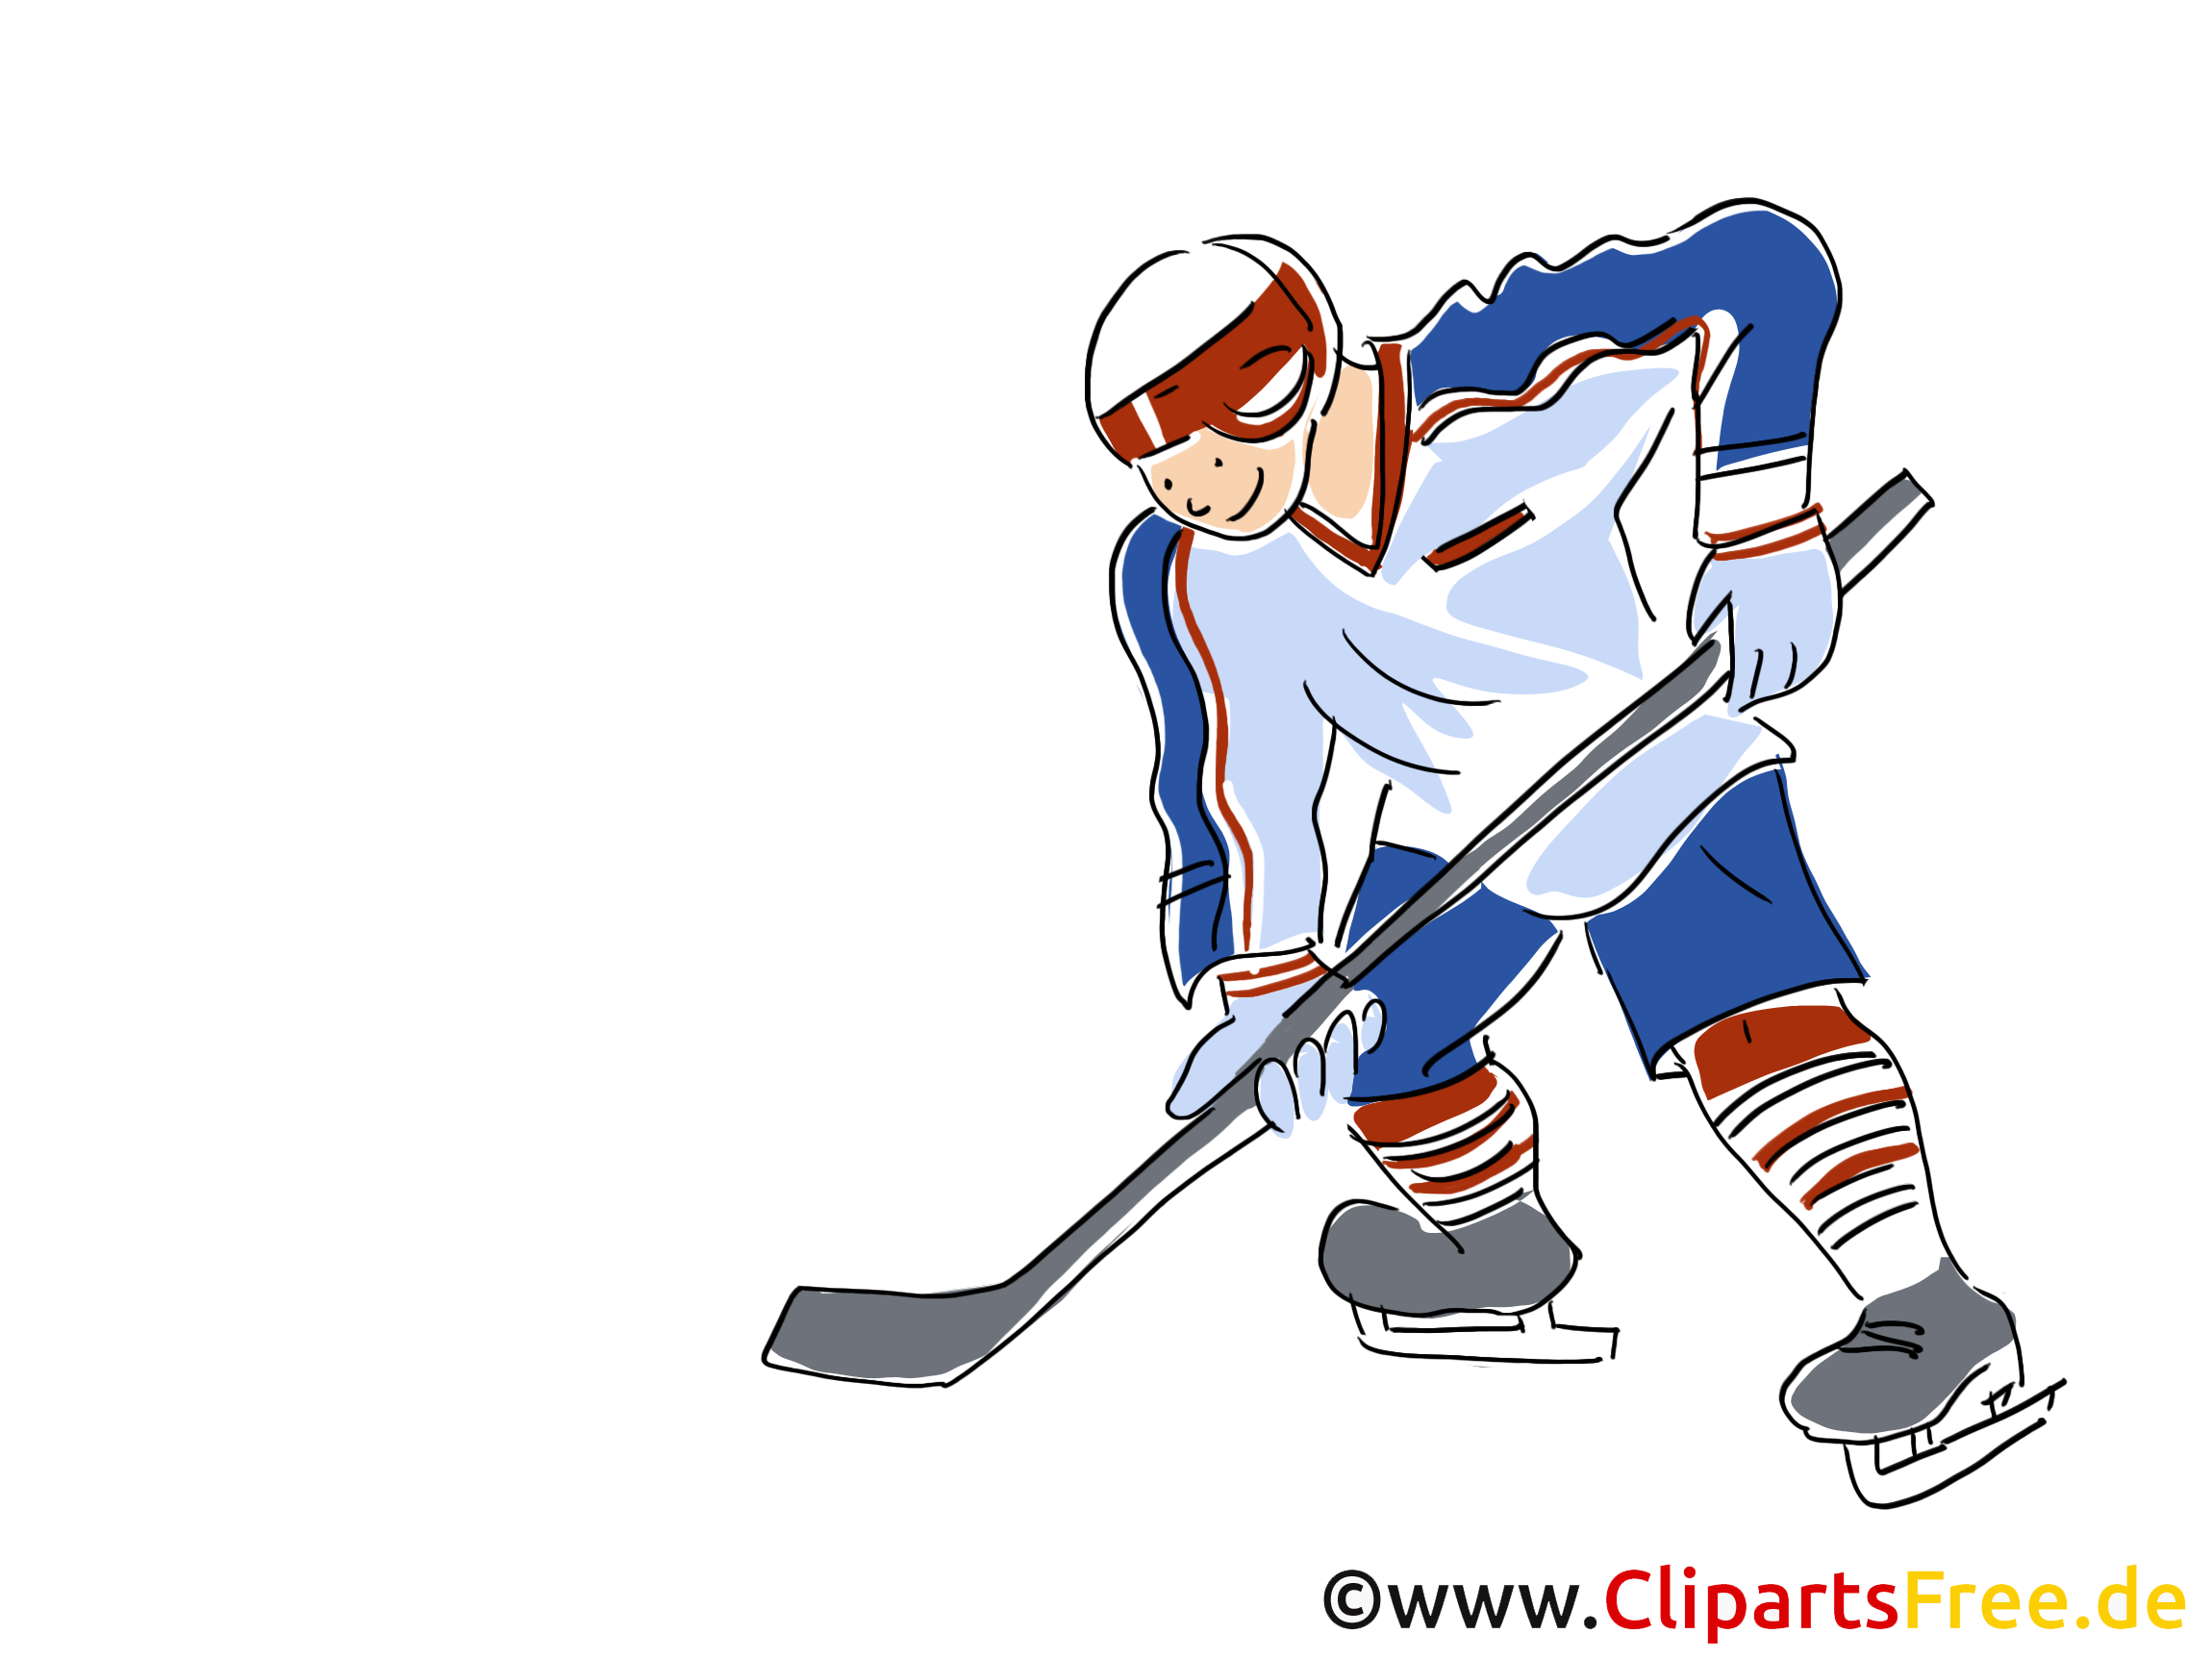 eishockeyspieler clipart bild comic cartoon